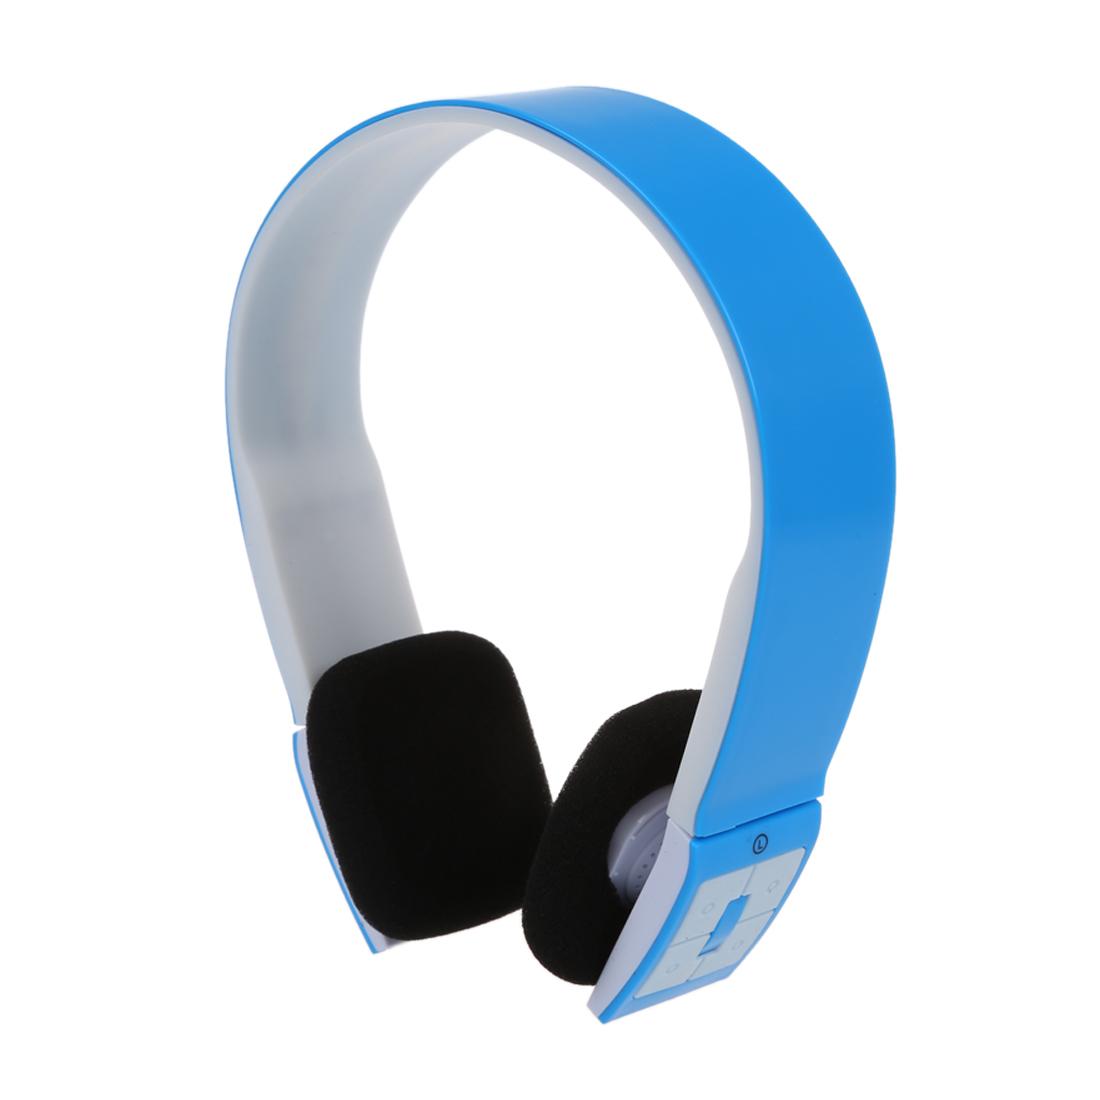 stereo dj style bluetooth wireless headset kopfhoerer fuer iphone ipad m9e1 ebay. Black Bedroom Furniture Sets. Home Design Ideas